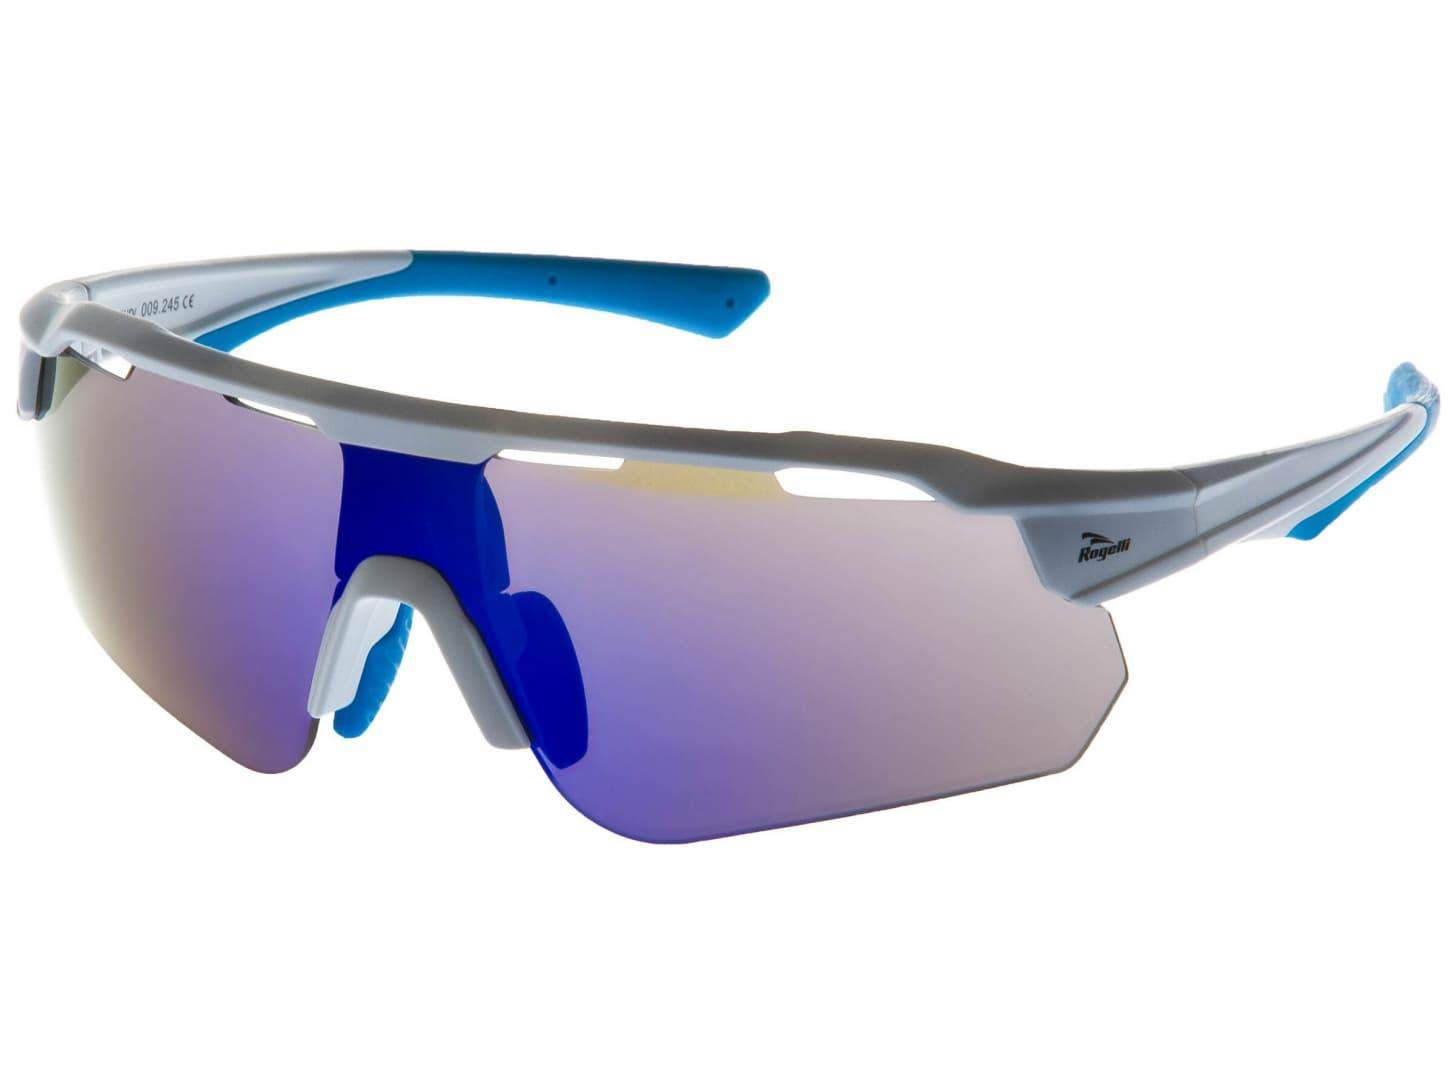 f0f60d9dc Cyklistické okuliare Rogelli MERCURY s výmennými sklami, bielo-modré ...